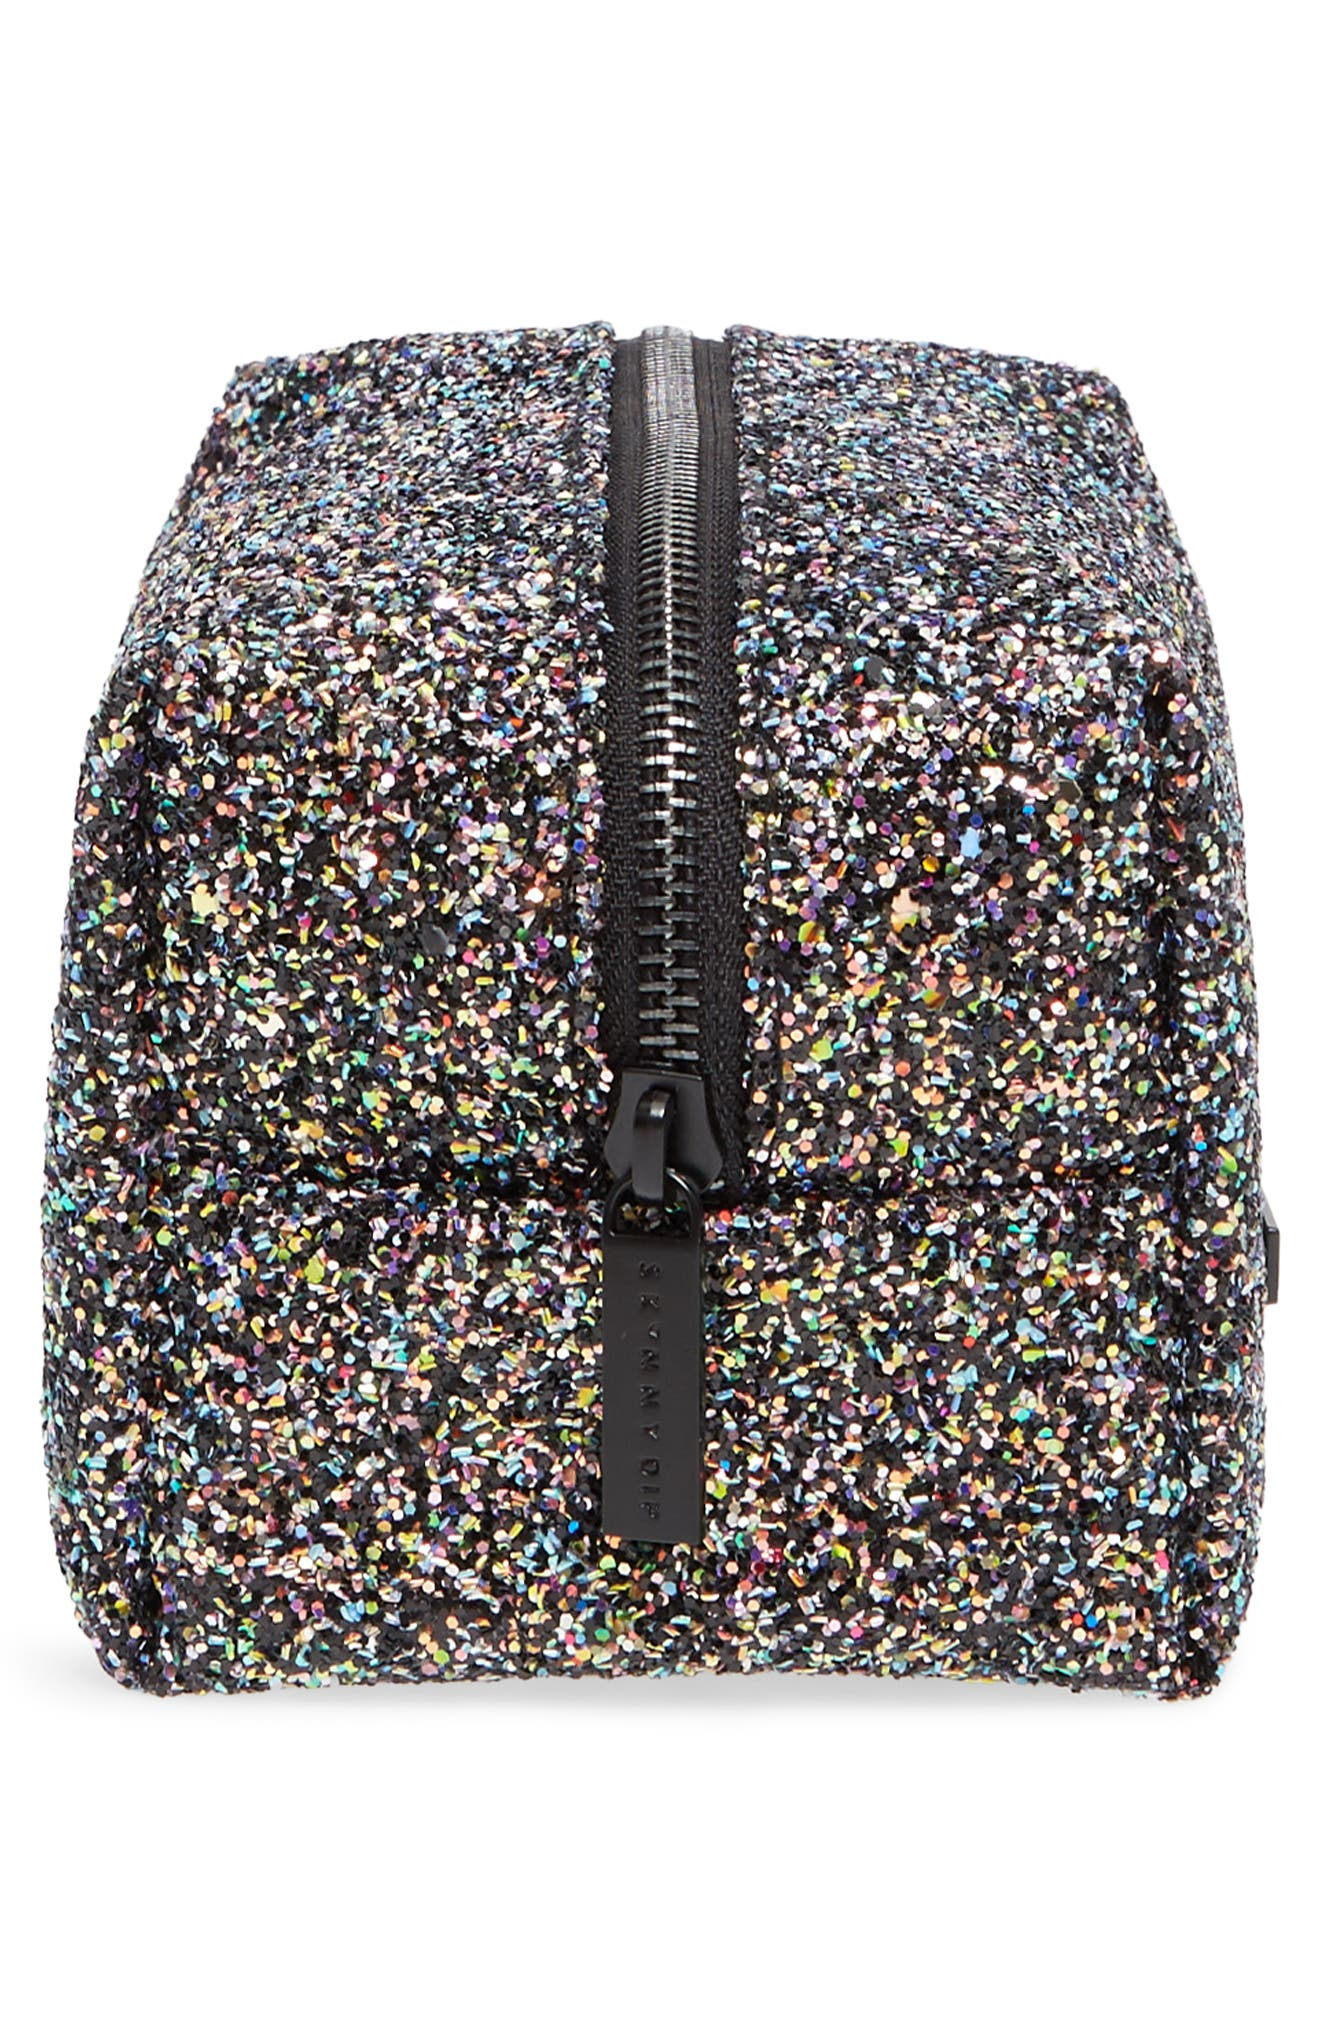 Skinny Dip Liquorice Glitter Cosmetics Bag,                             Alternate thumbnail 4, color,                             No Color